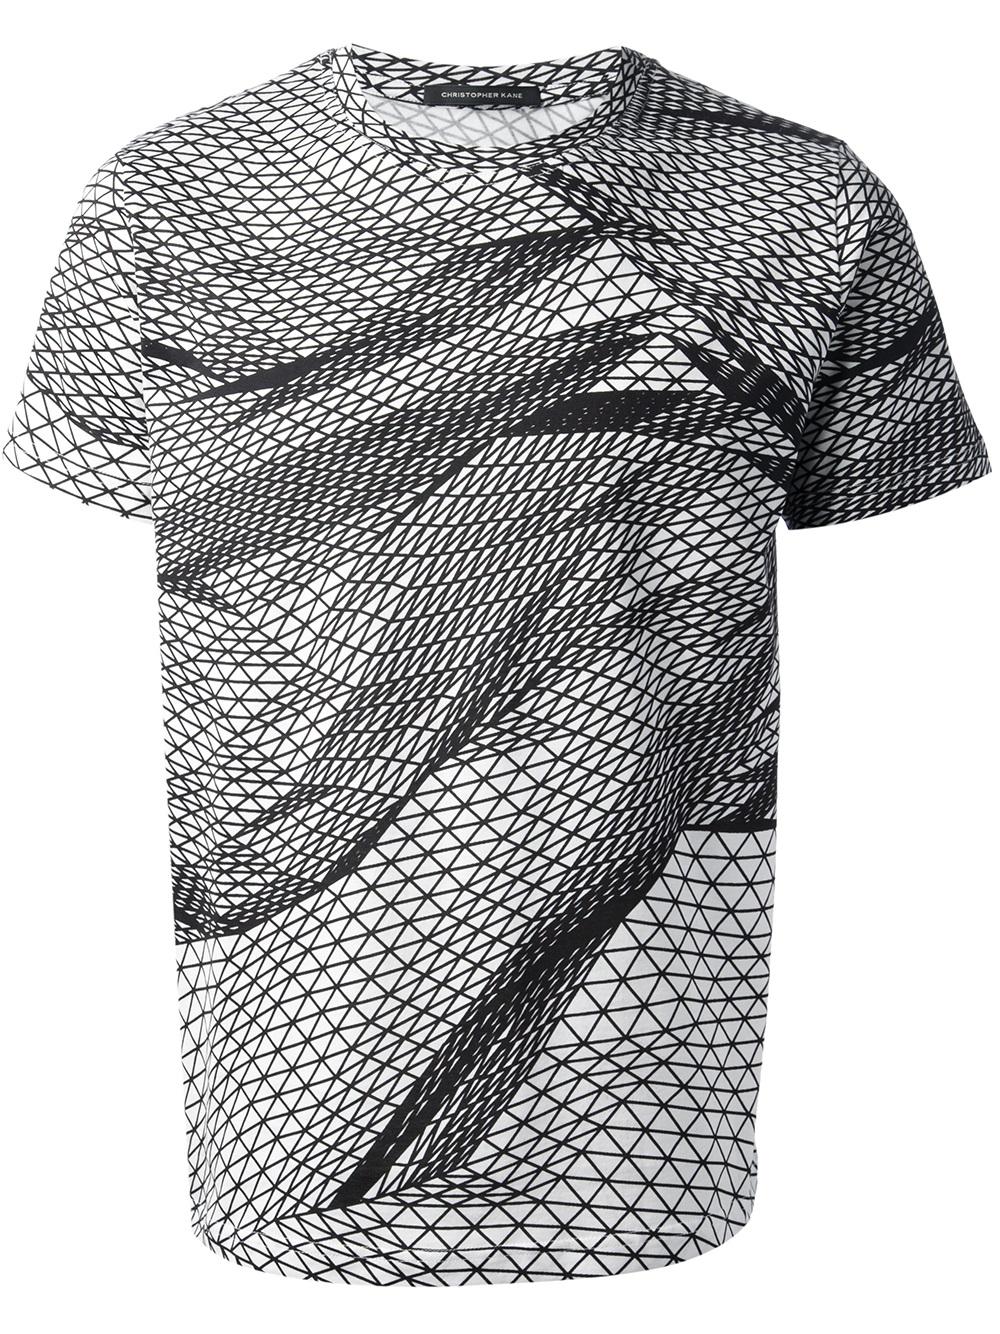 christopher kane landscape digital printed tshirt in white